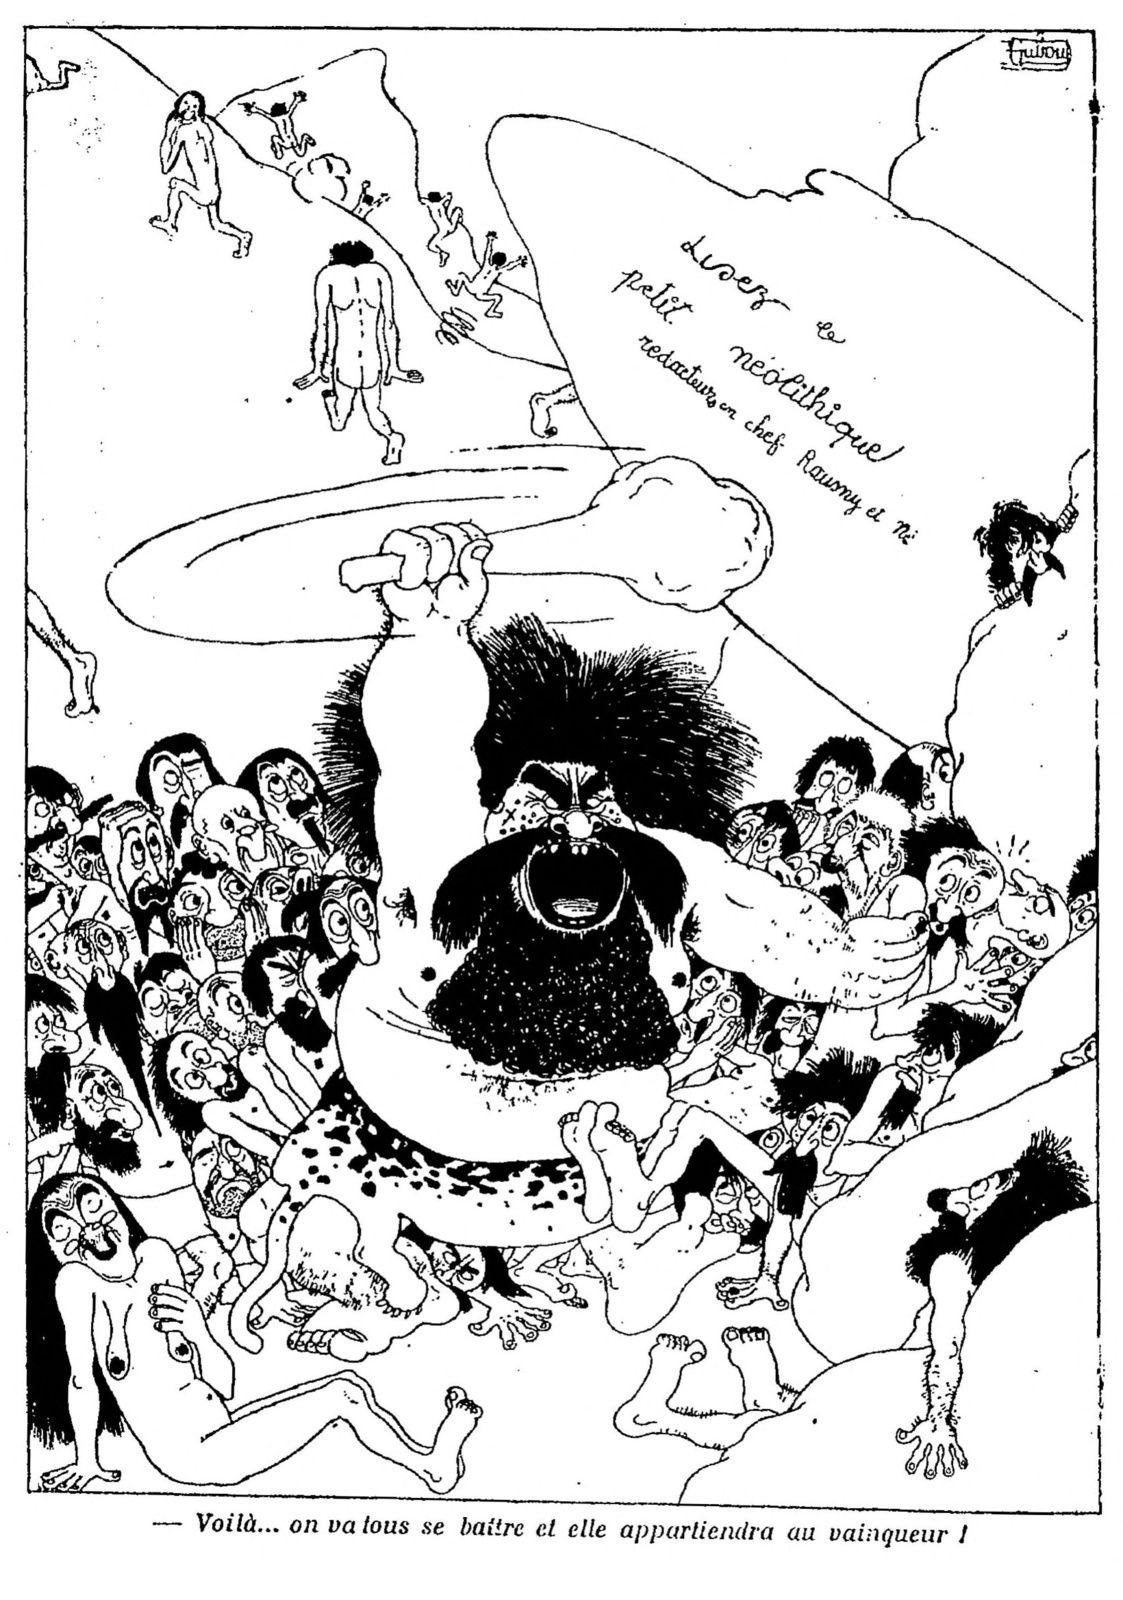 Allusions : Rausny et Né (1930)